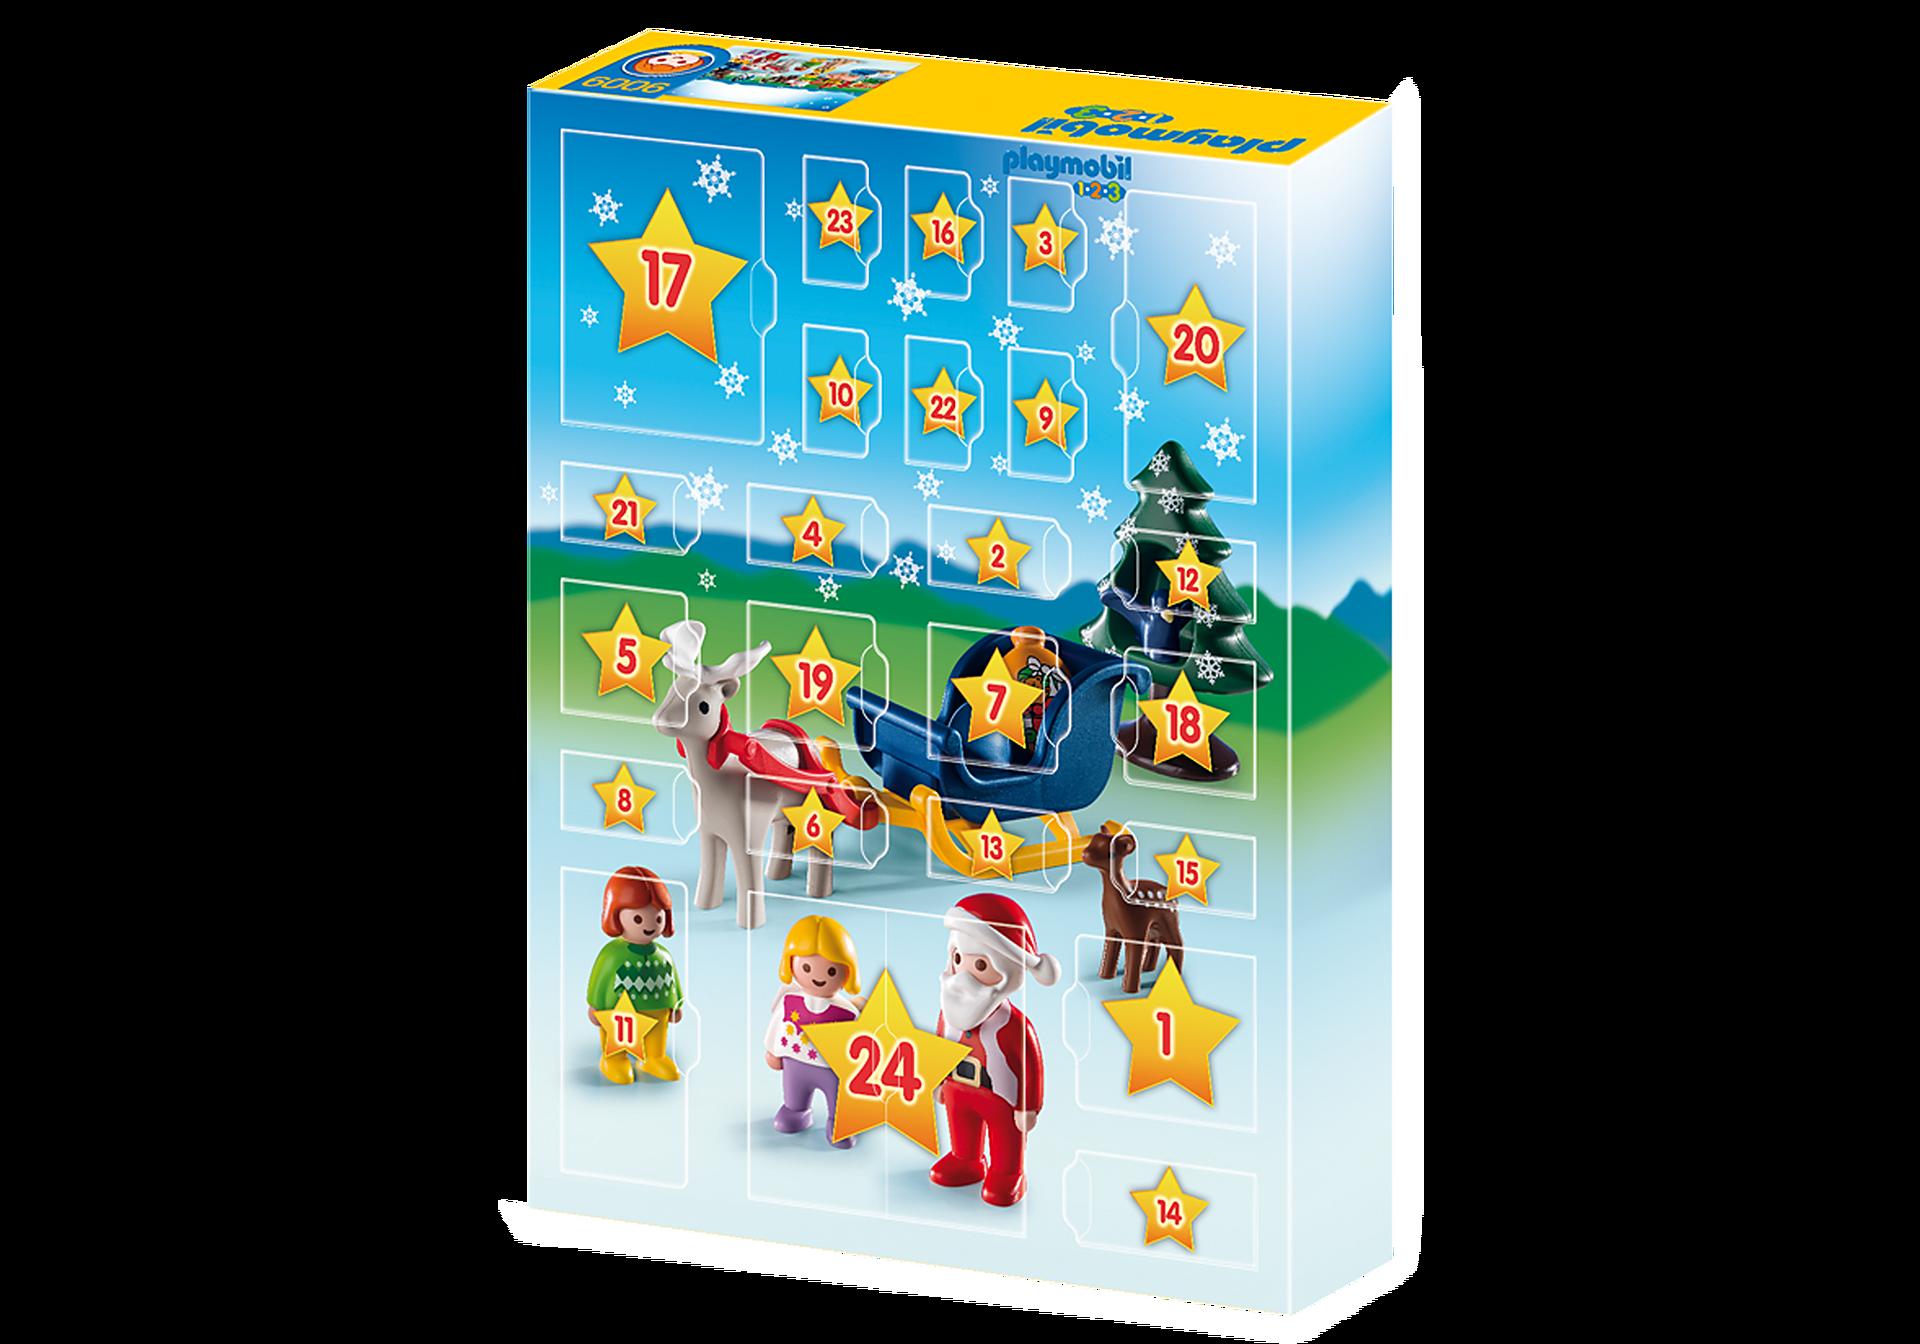 http://media.playmobil.com/i/playmobil/9009_product_extra2/1.2.3 Calendario de Navidad - Granja de Animales